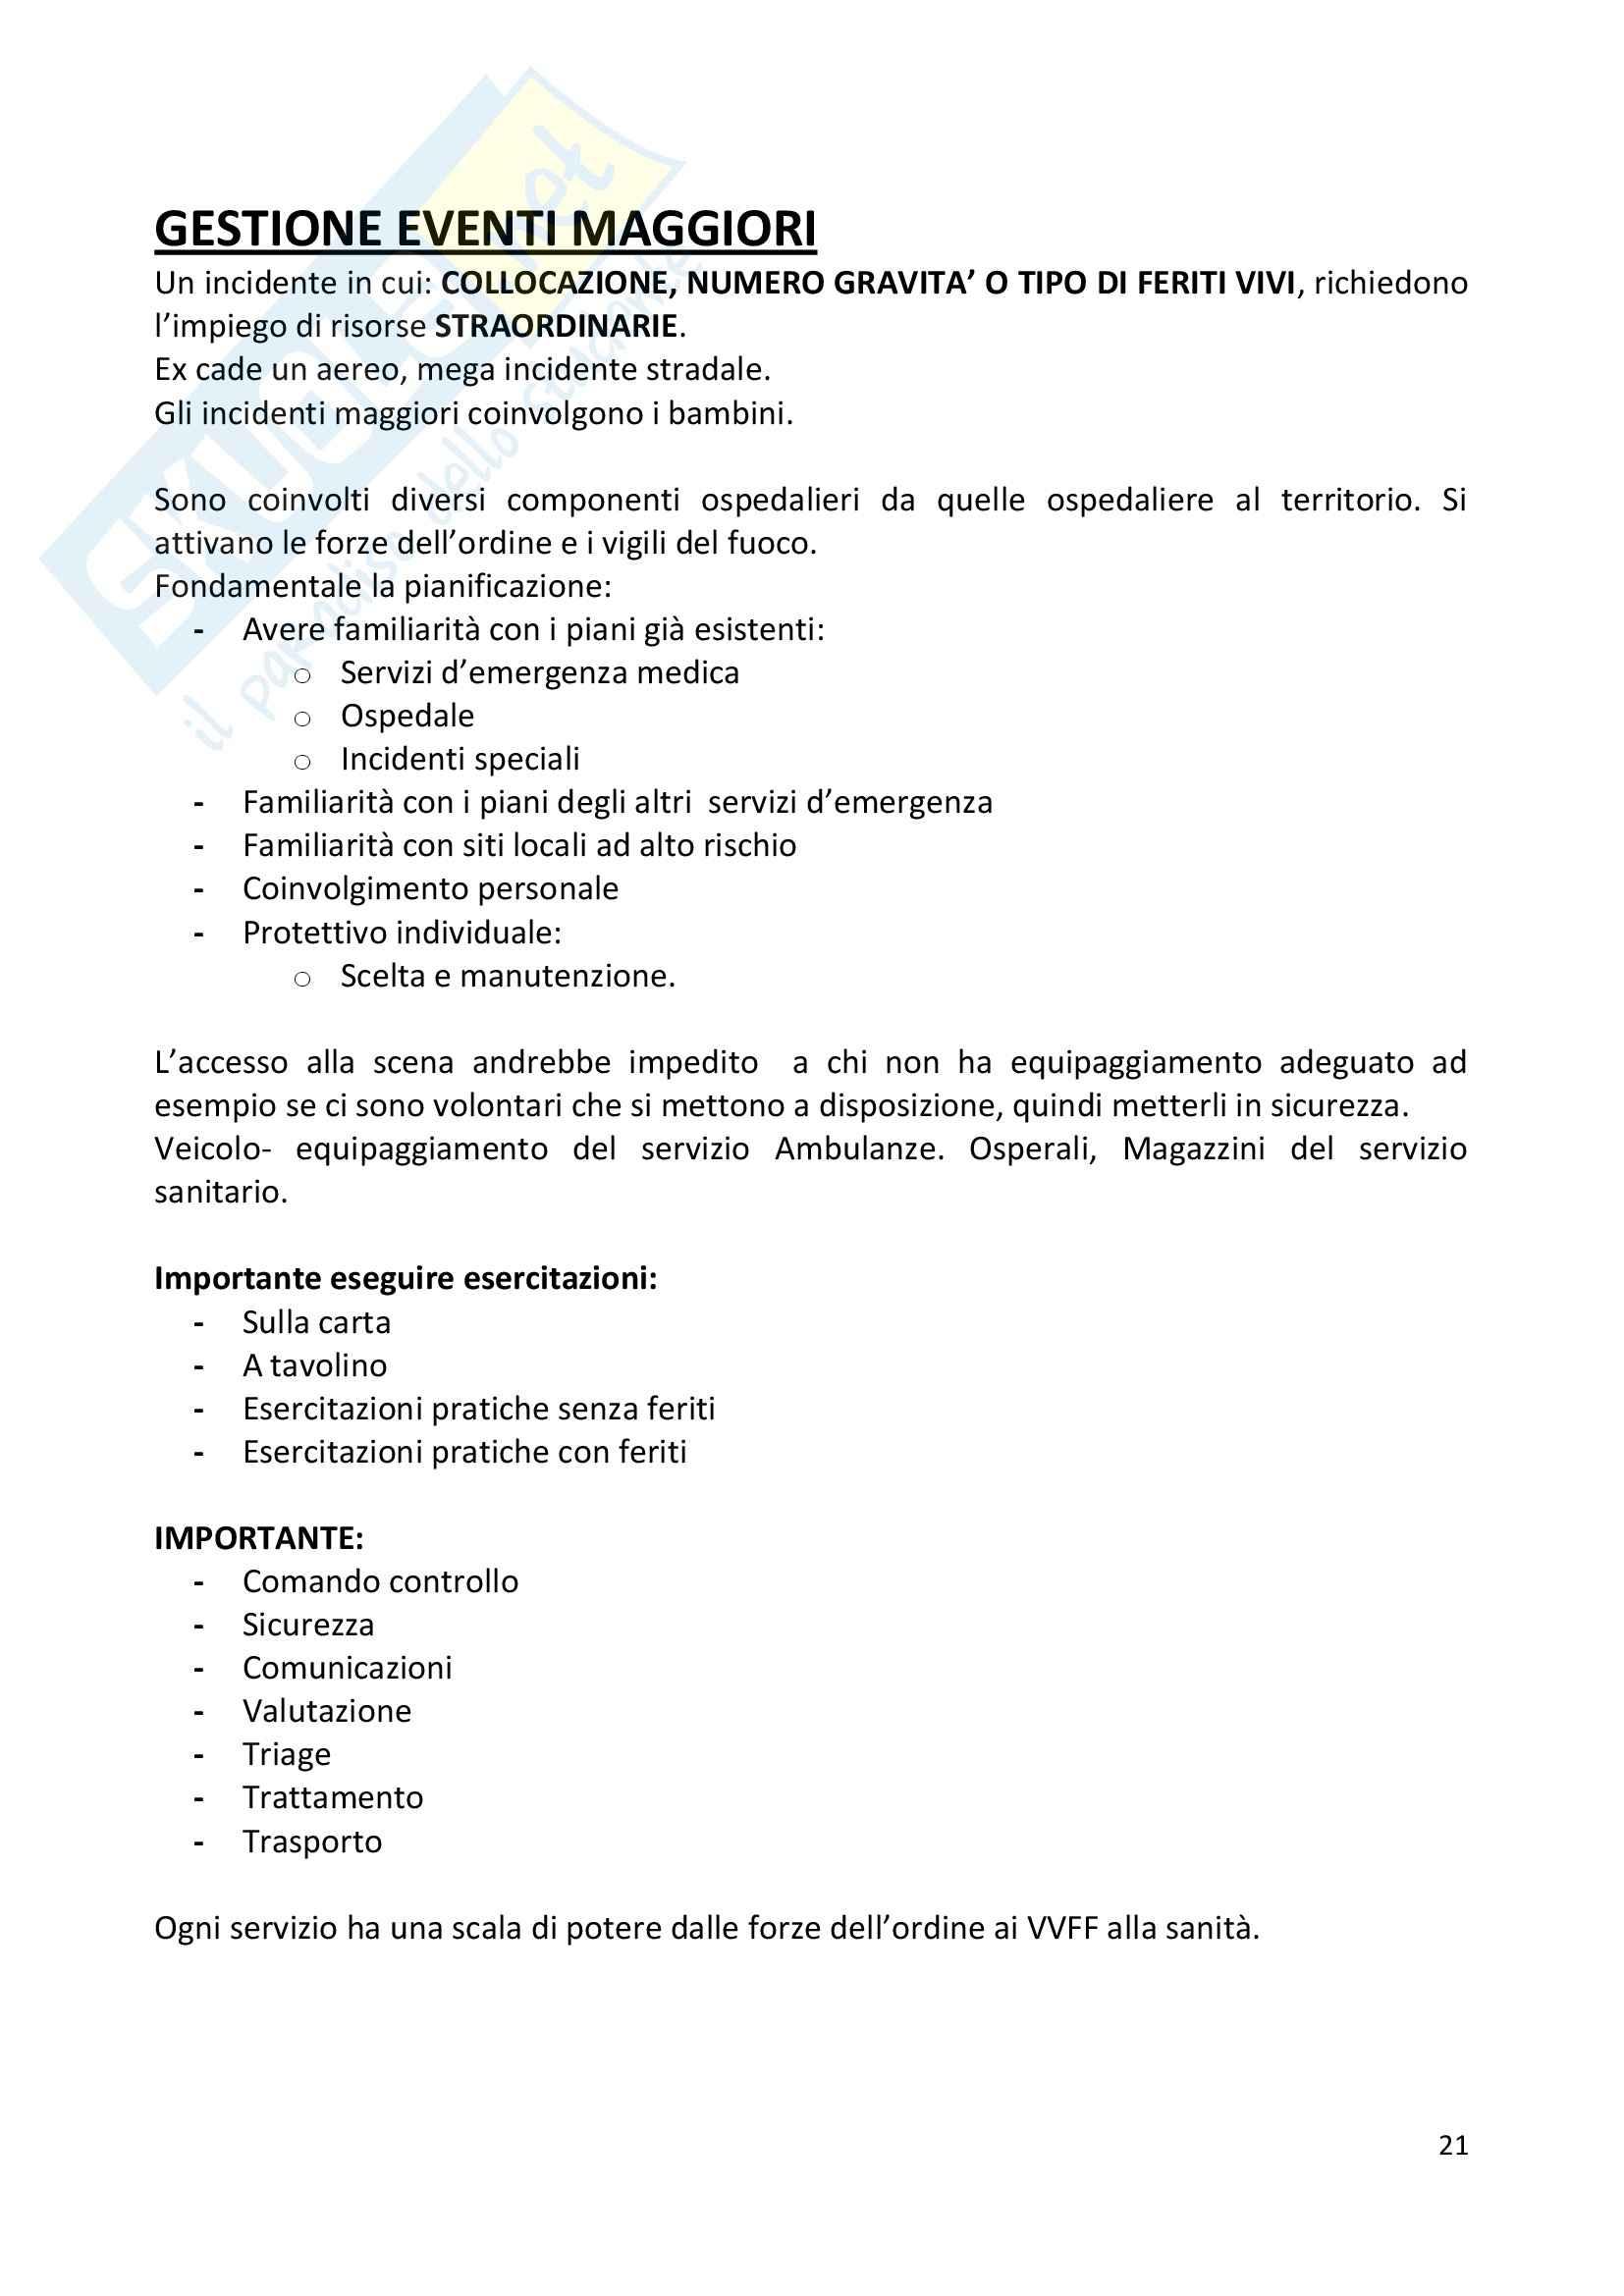 Infermieristica d'urgenza e intensiva (infermieri) Pag. 21